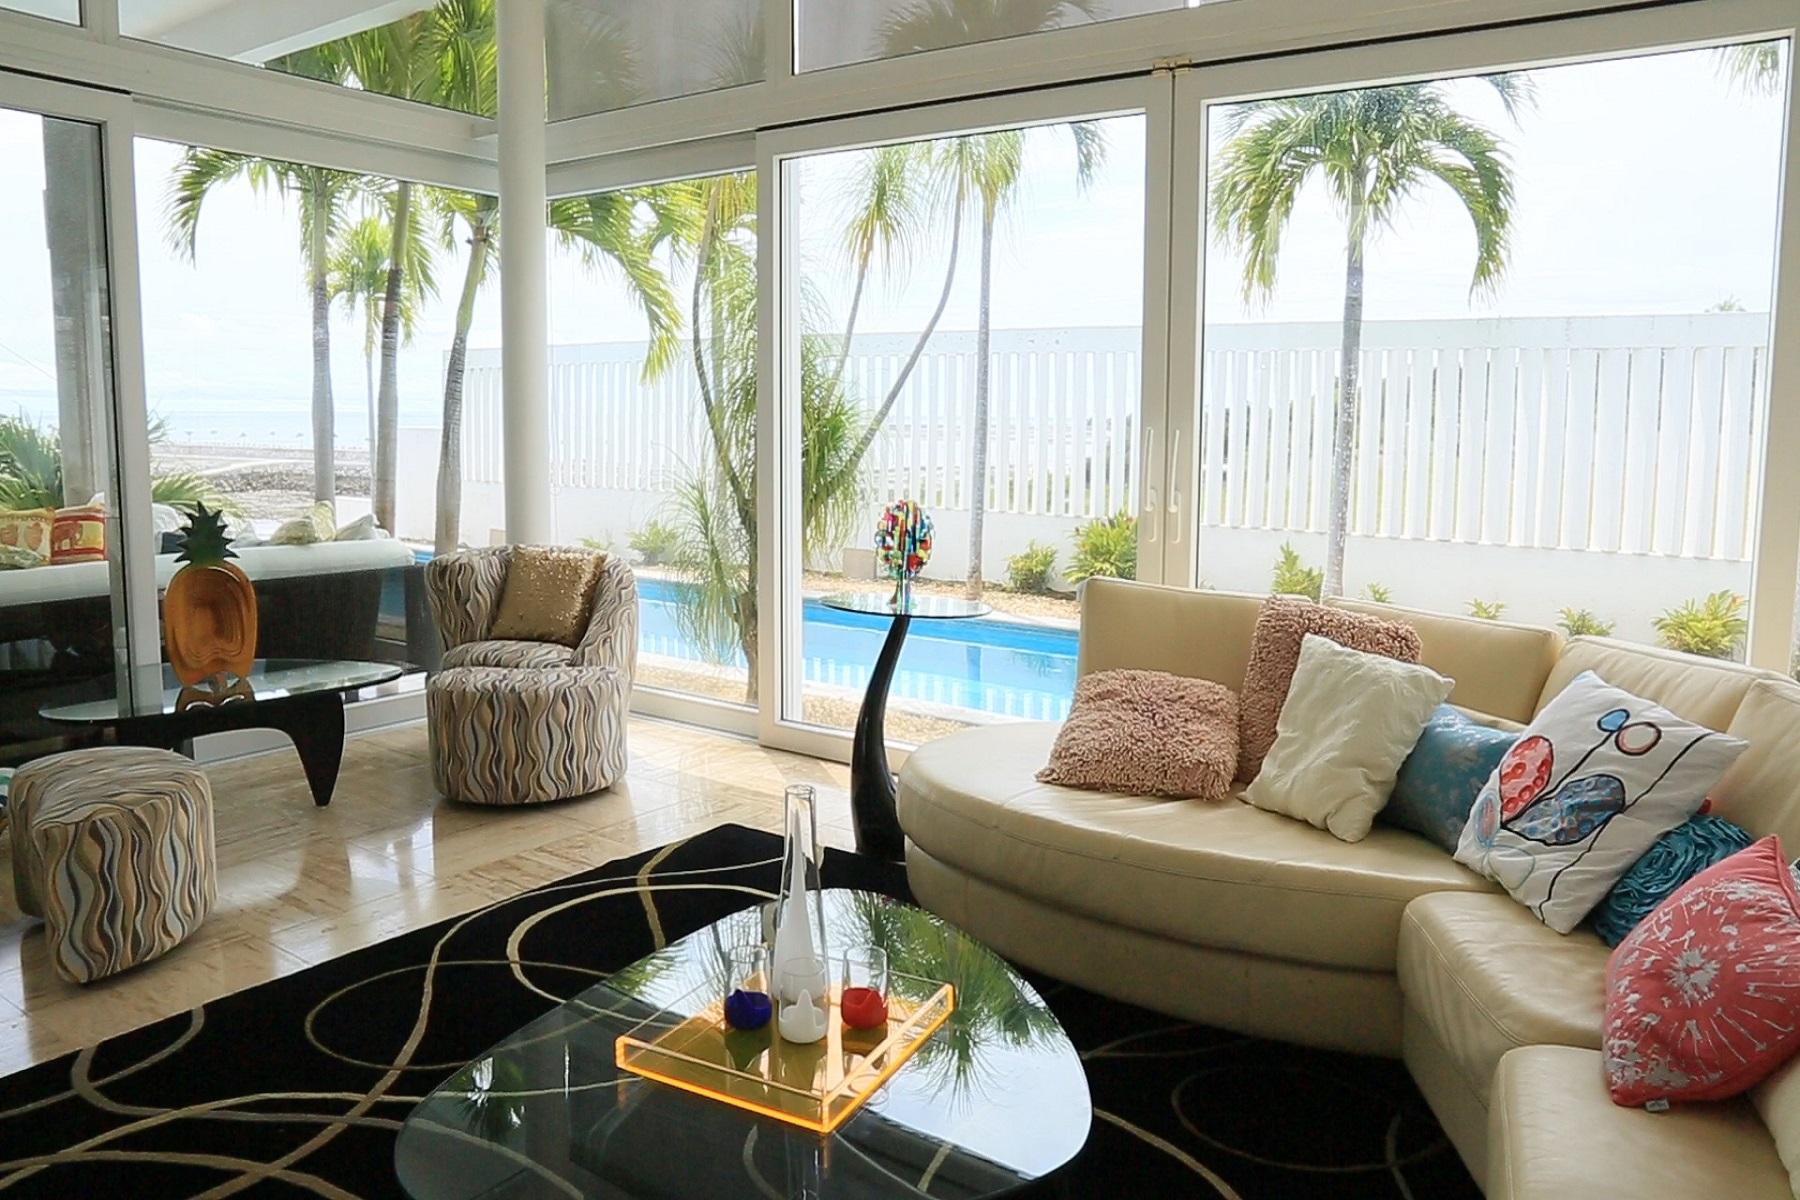 Single Family Home for Sale at ELEGANT OCEANFRONT HOUSE Panama City, Panama, Panama